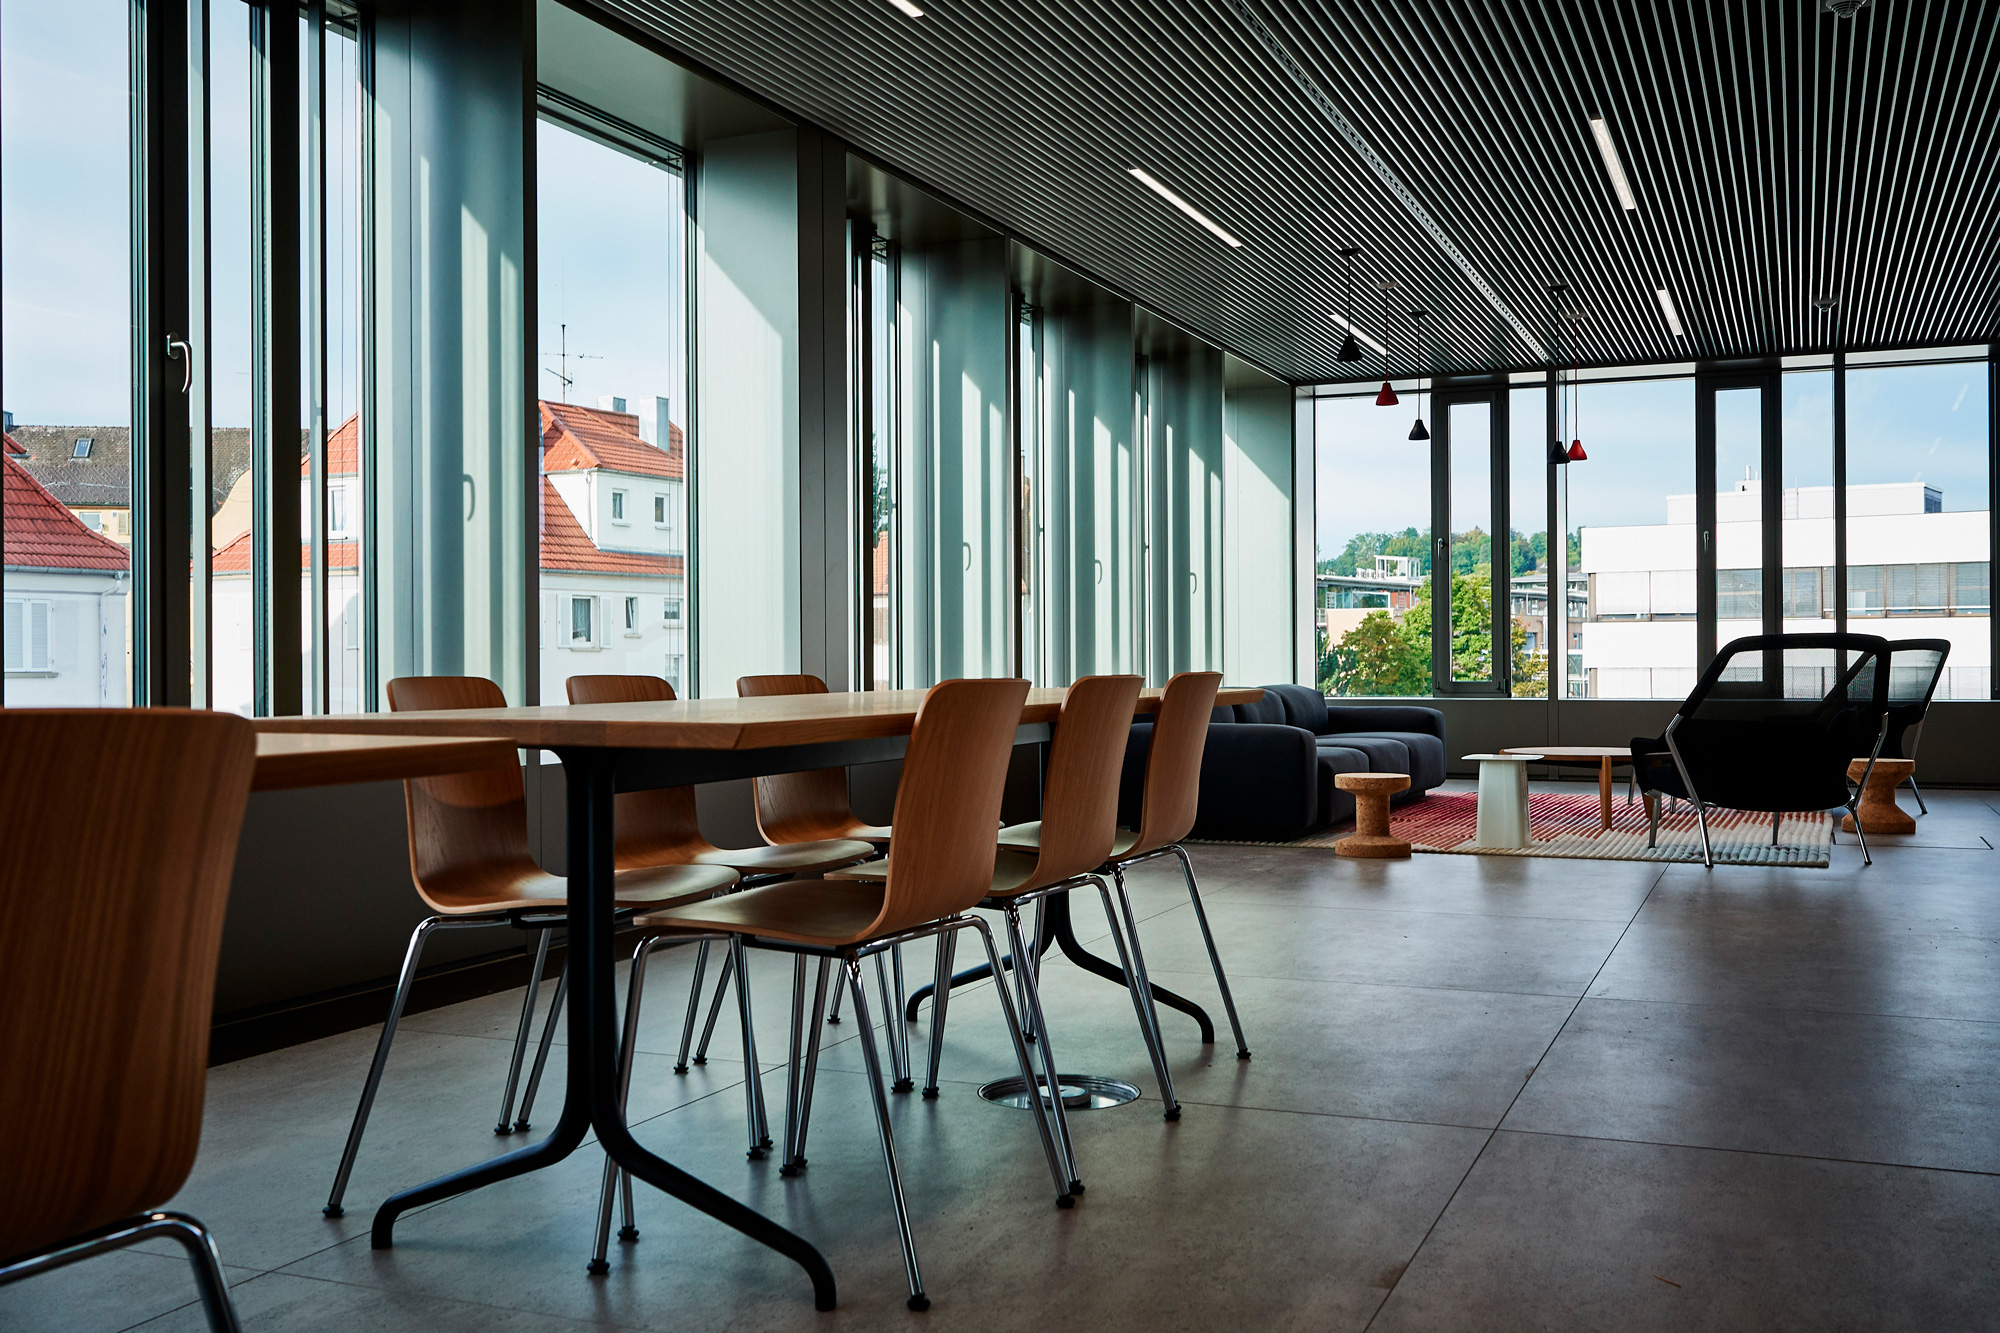 Kreissparkasse  - KSK Rottweil Casino2 54